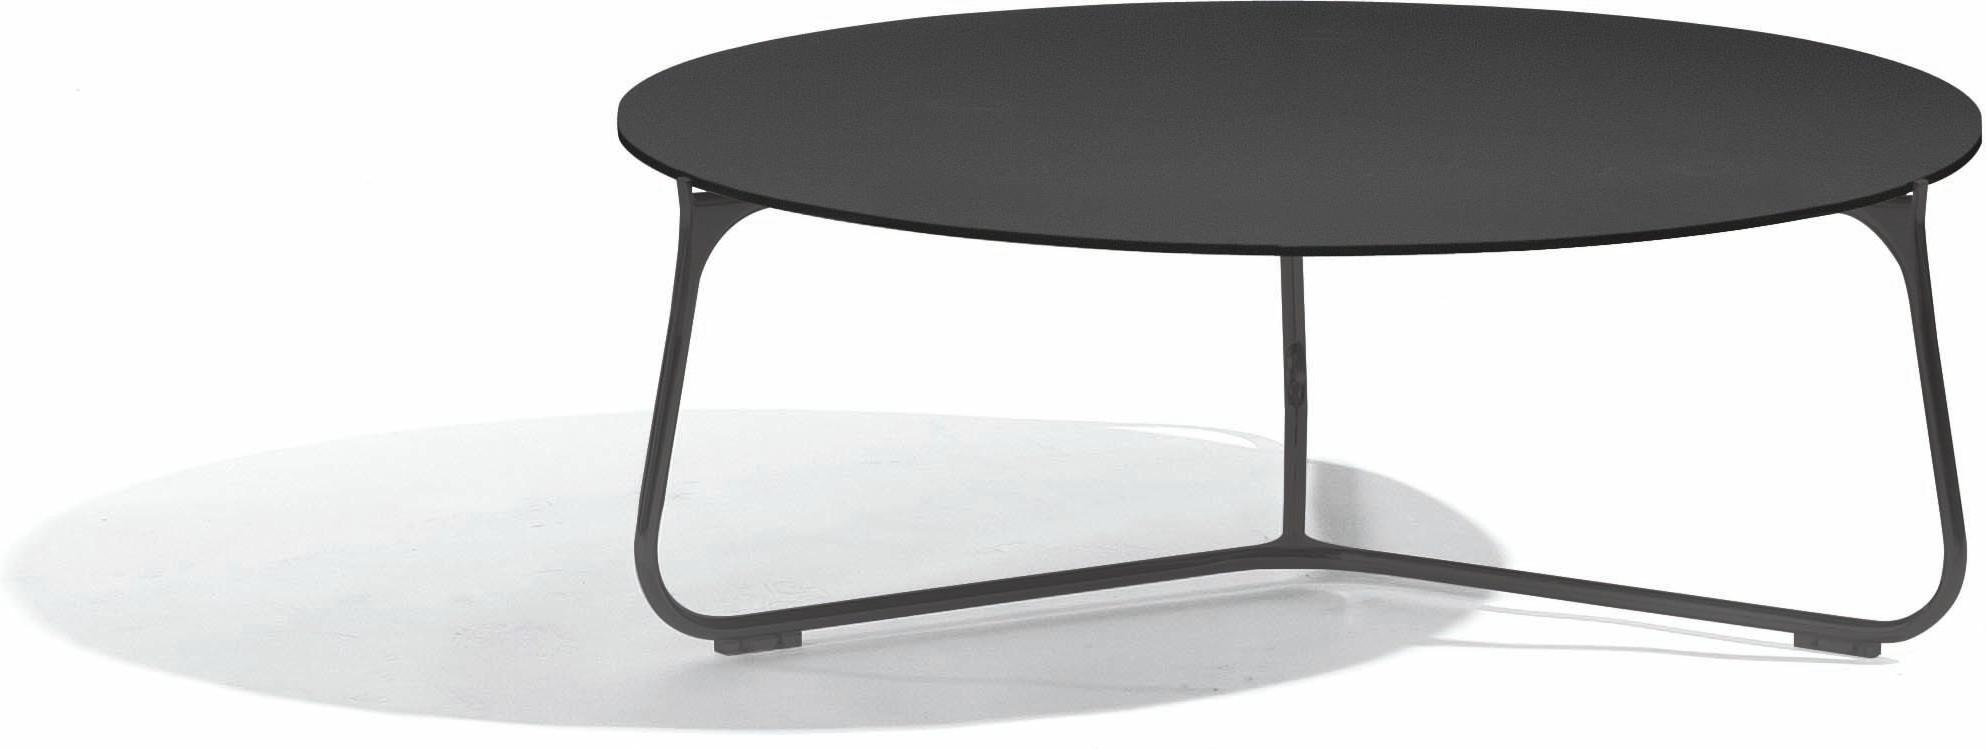 Mood coffee table - lava - glass black - 80